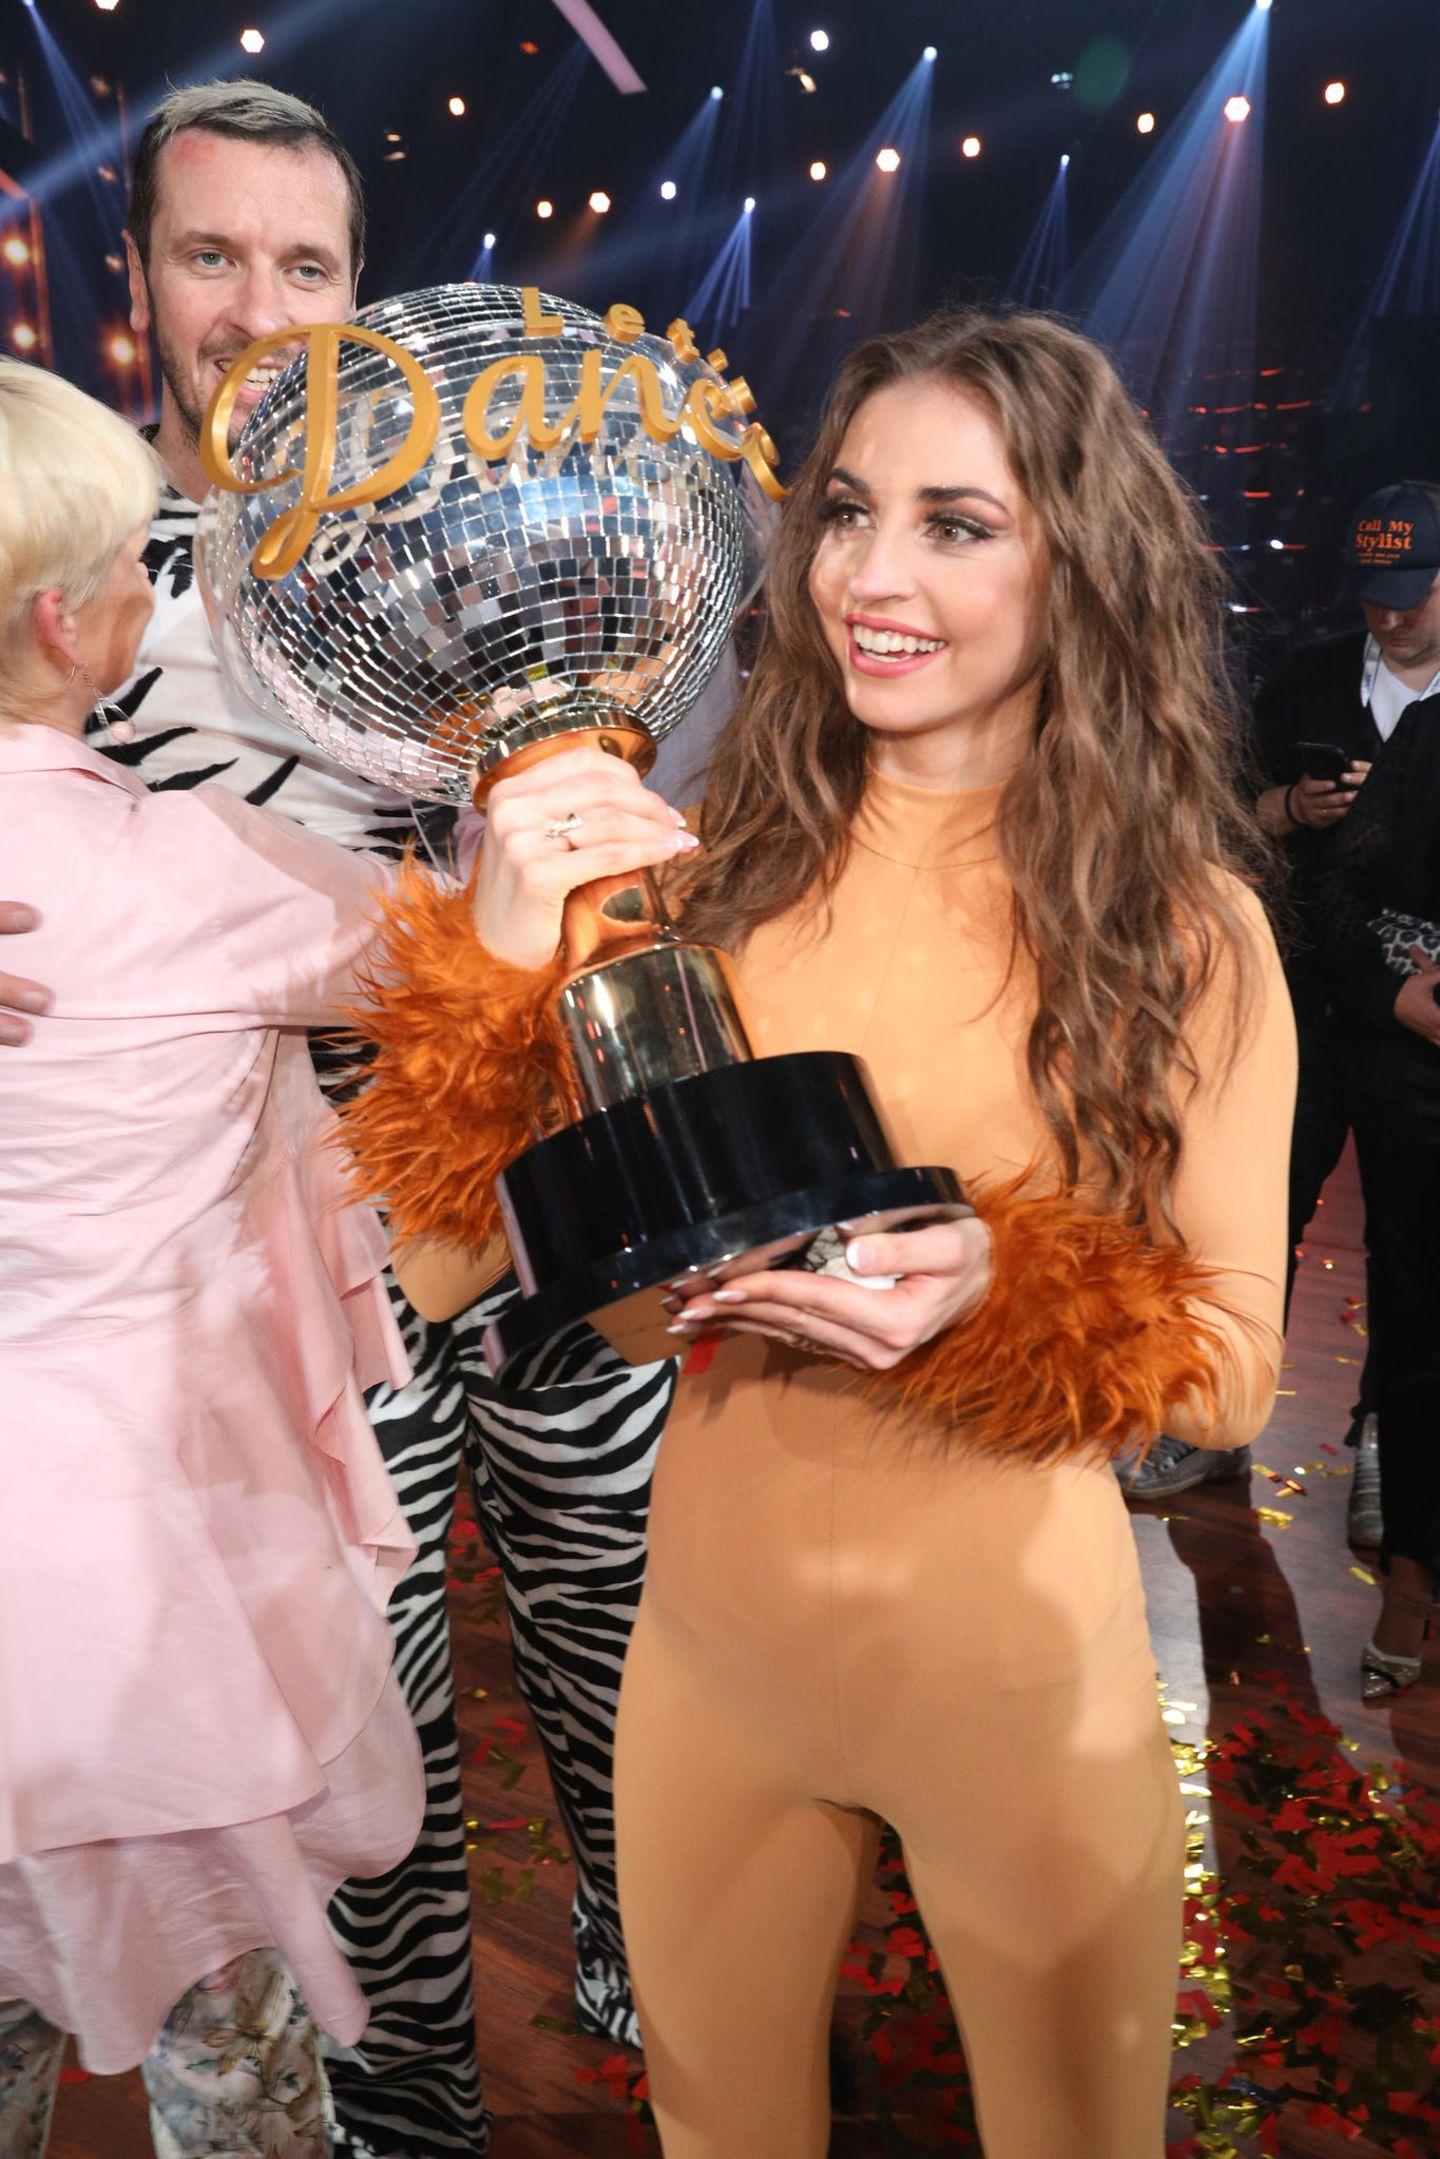 Ekaterina Leonova: Beliebter Let's-Dance-Profi diesmal NICHT dabei!